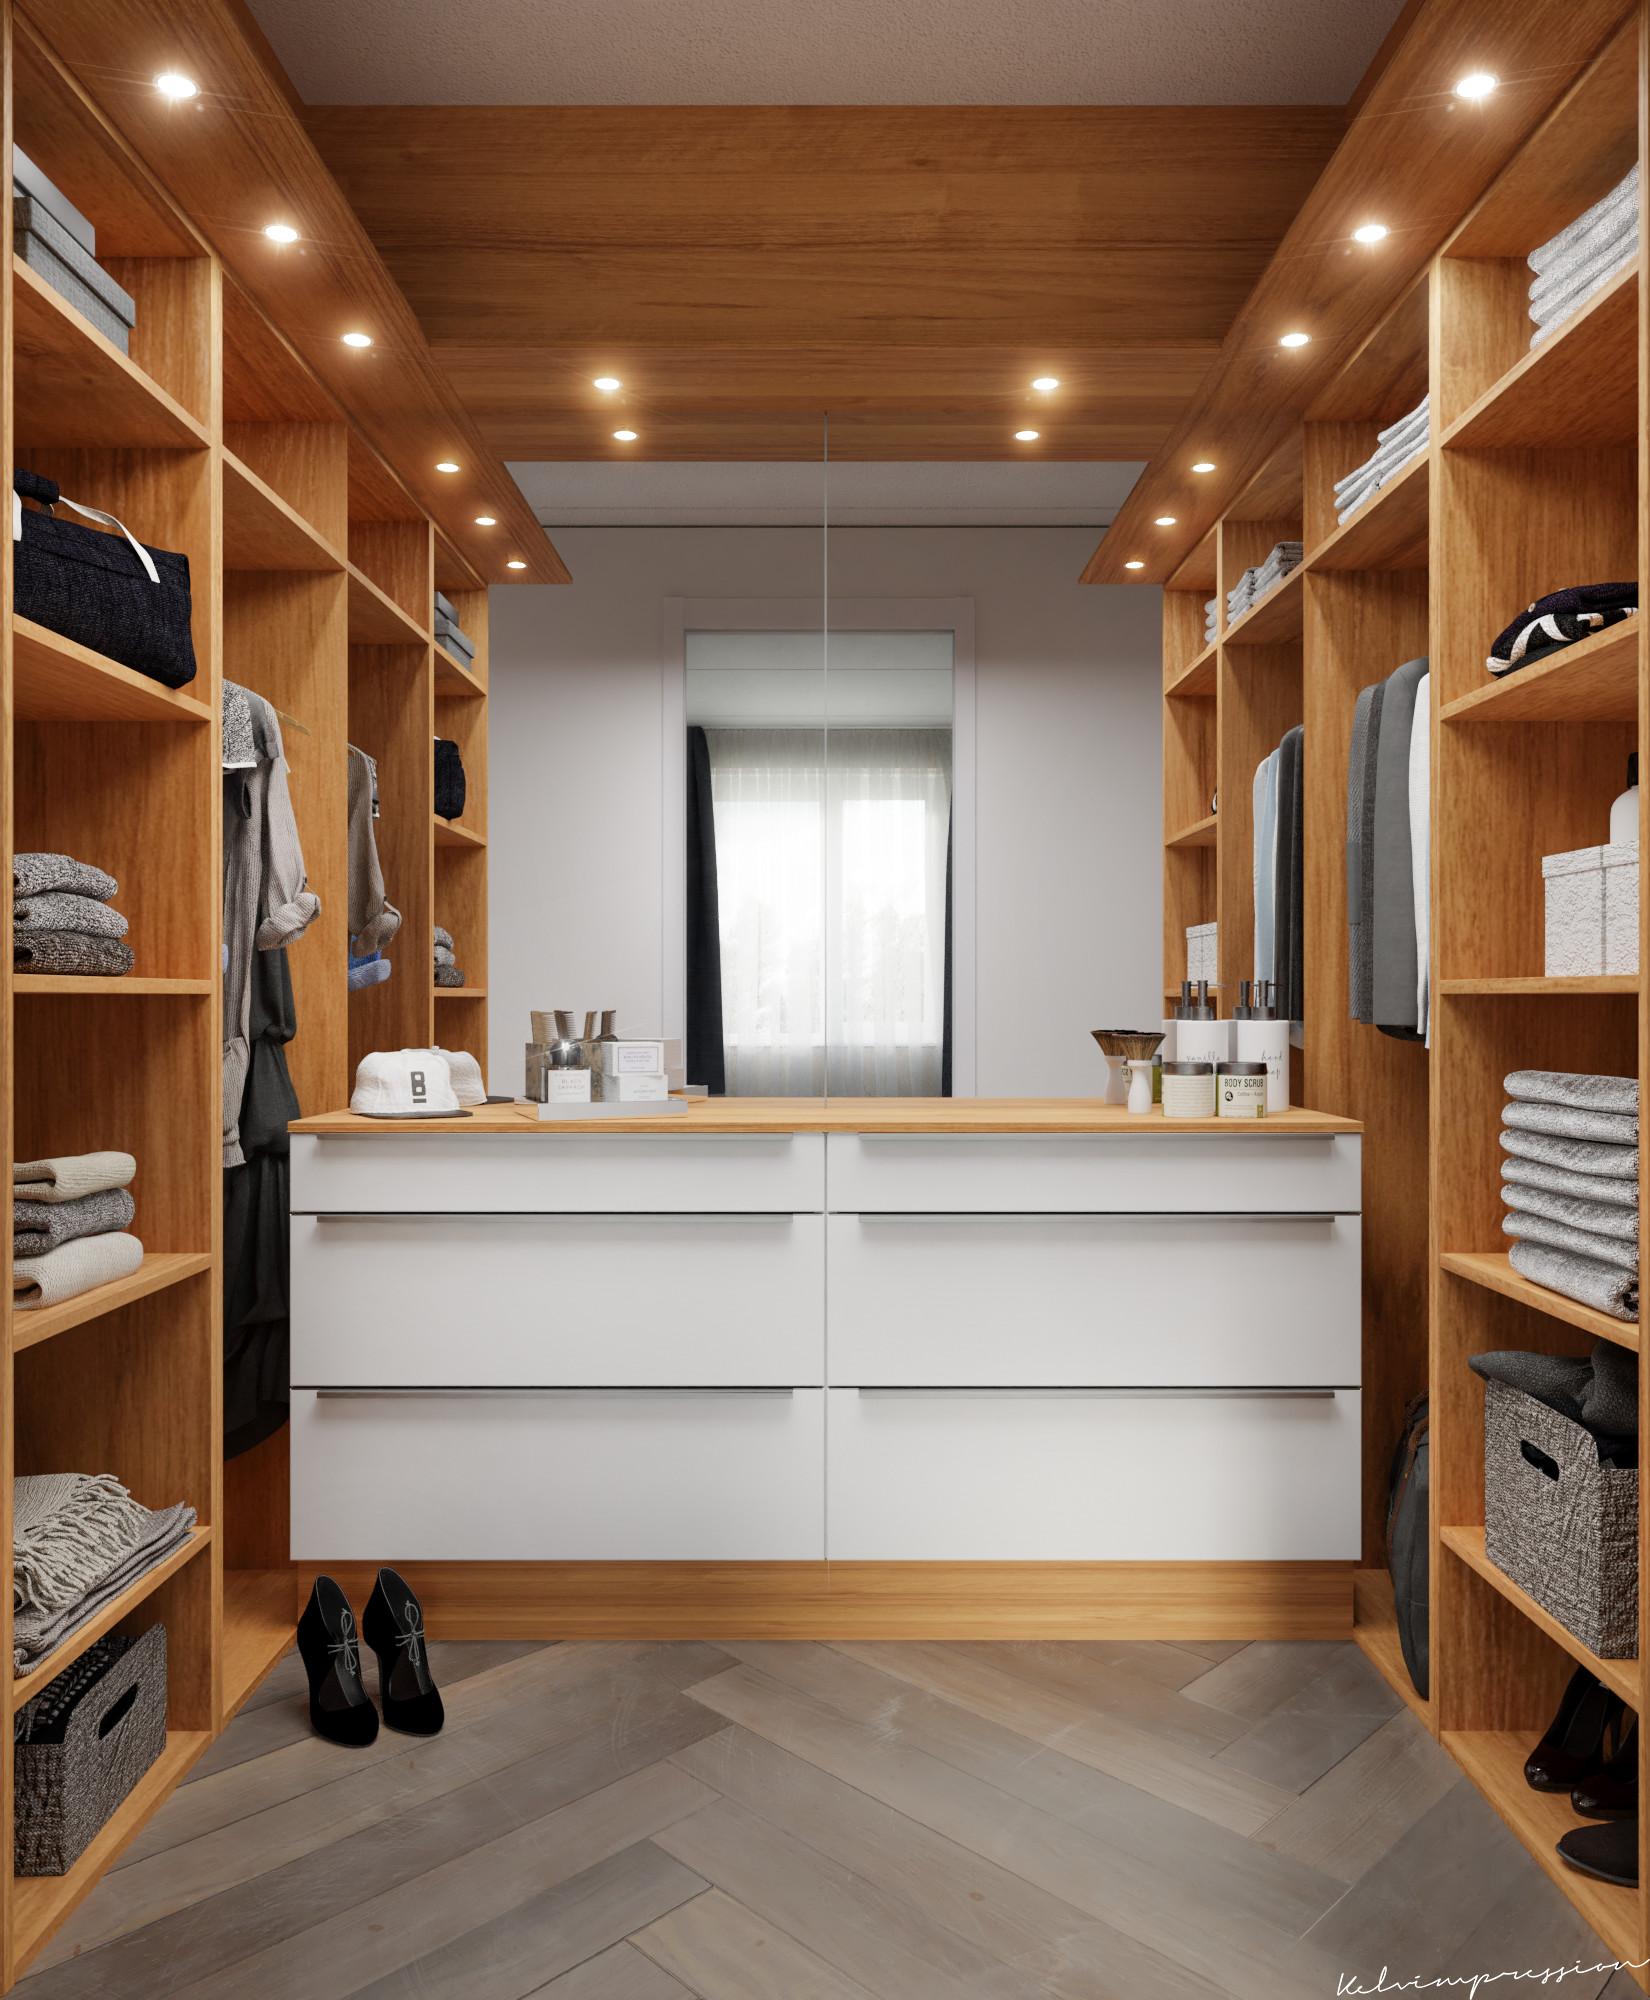 Inloopkast Walk In Closet.Kelvin Leusink Small Walk In Closet